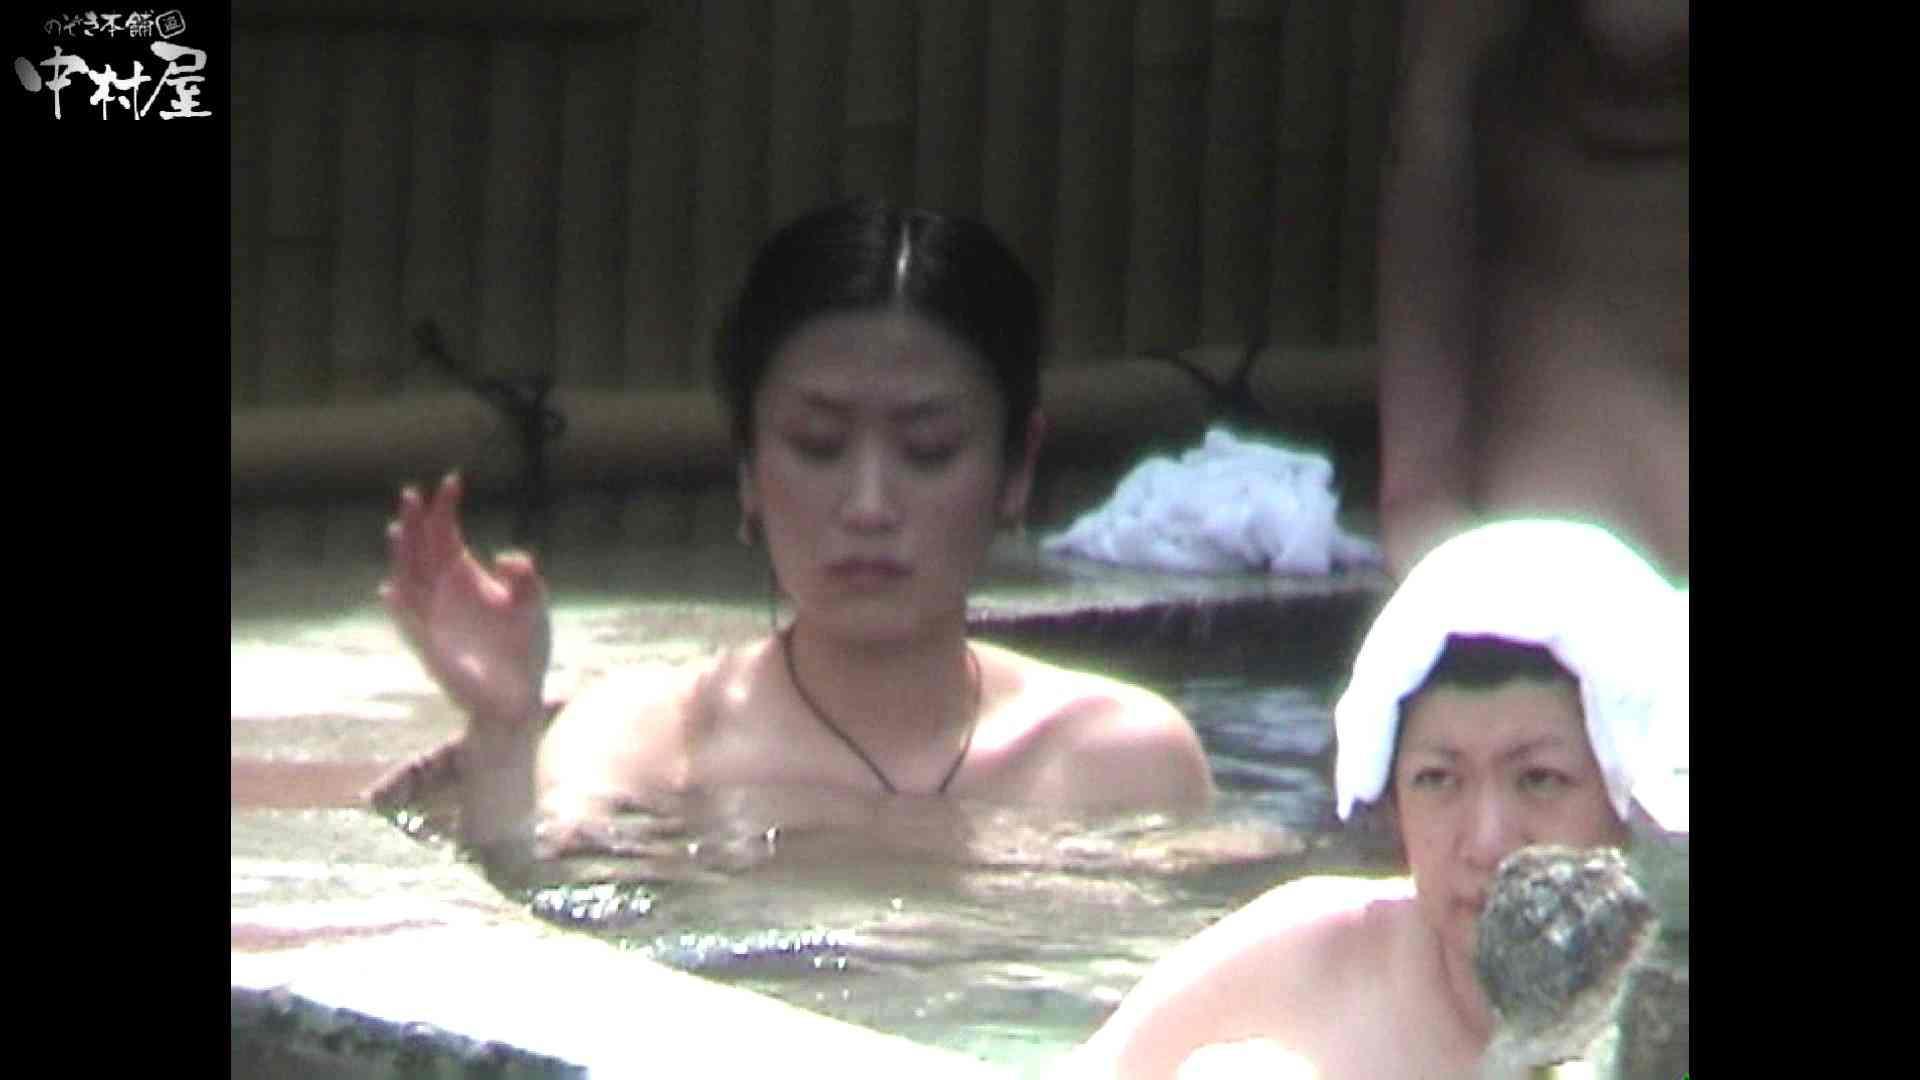 Aquaな露天風呂Vol.934 OLセックス | 露天  66画像 28